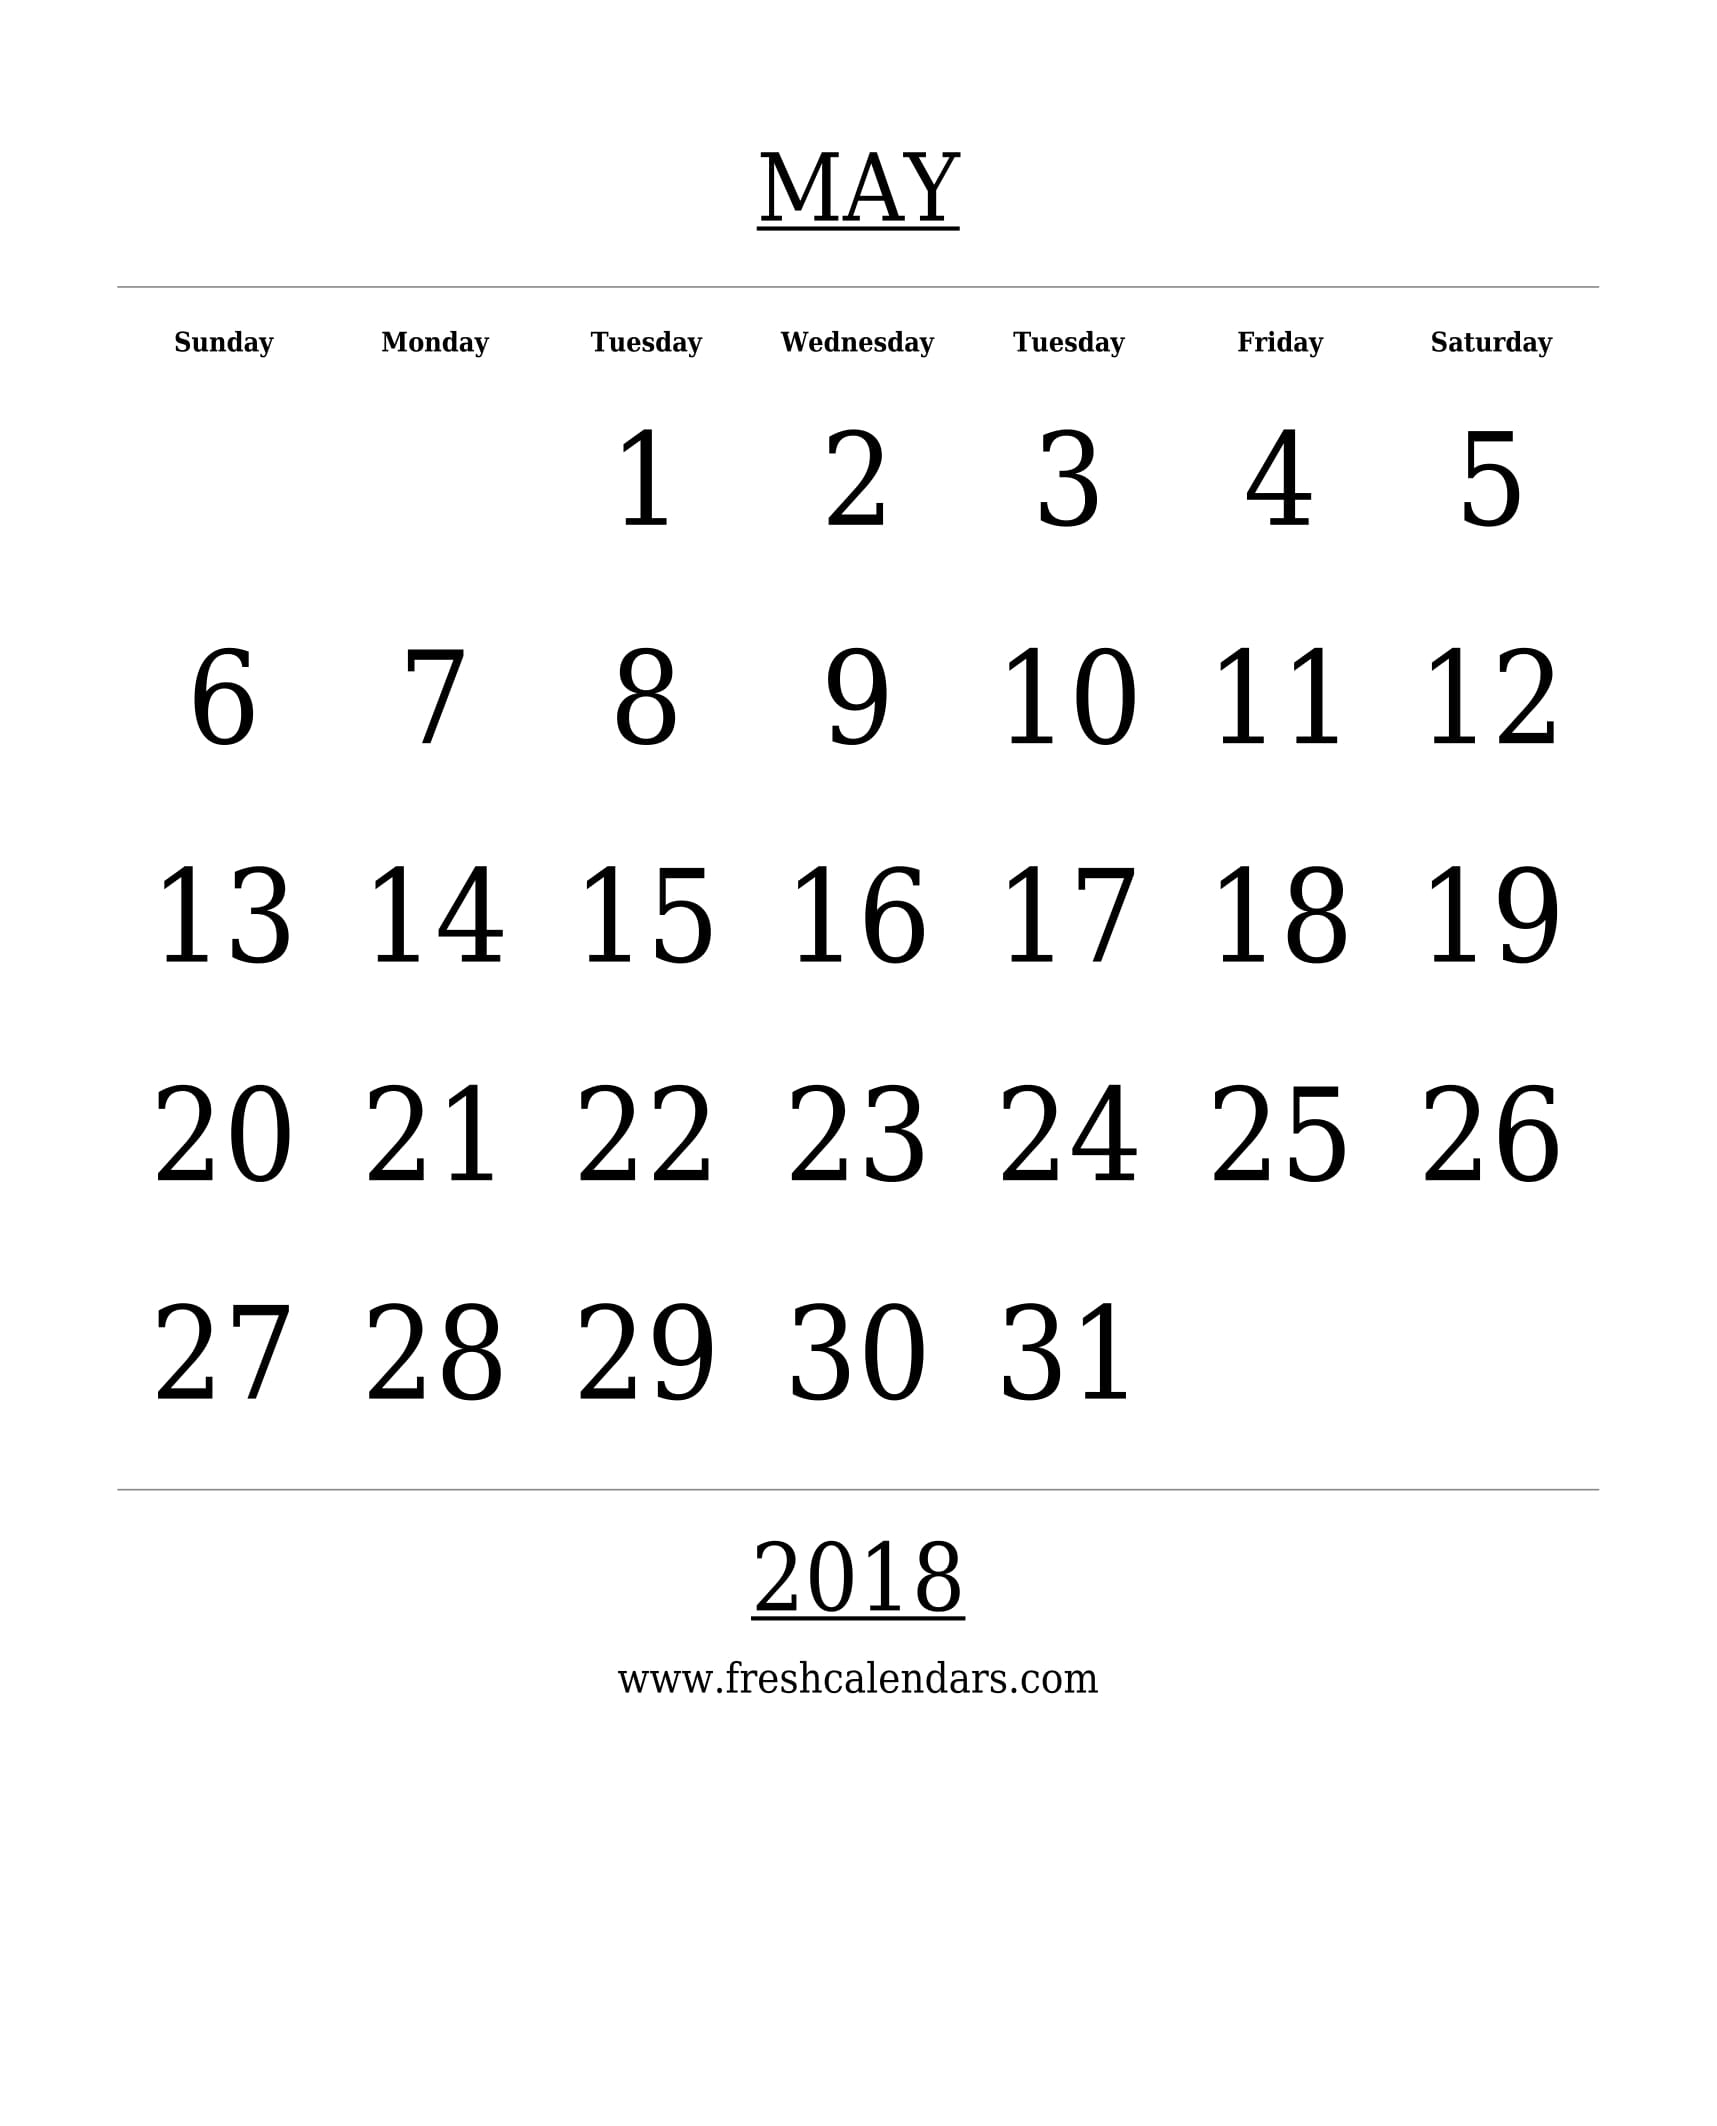 Free Printable Template May 2018 Calendar Bold Style 89uj